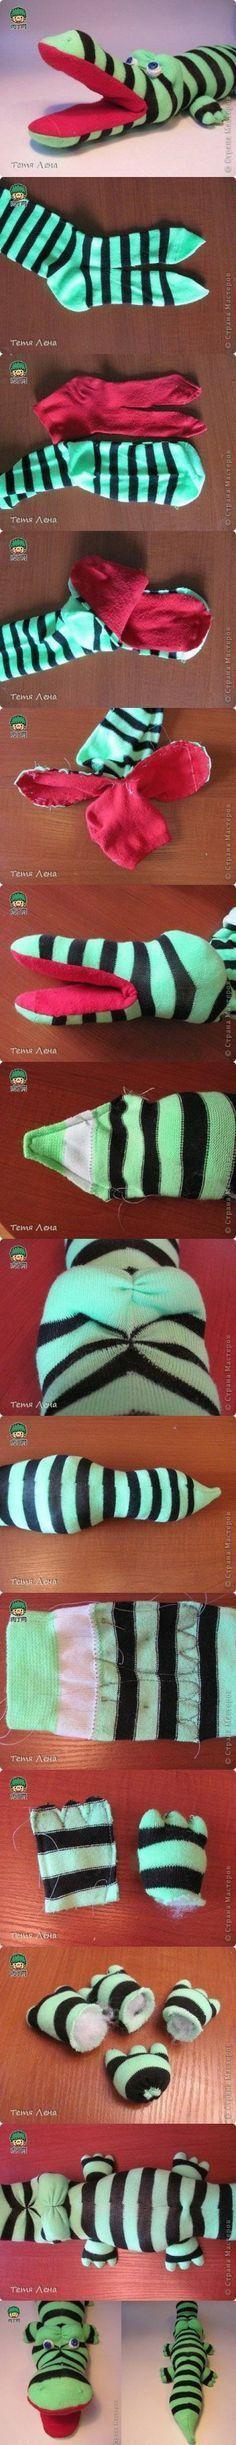 How to Save Money on Kids' Toys DIY Sock Crocodile Stuffed Animal Sock Crafts, Fabric Crafts, Fun Crafts, Sewing Toys, Sewing Crafts, Sewing Projects, Diy Projects, Sewing Art, Project Ideas